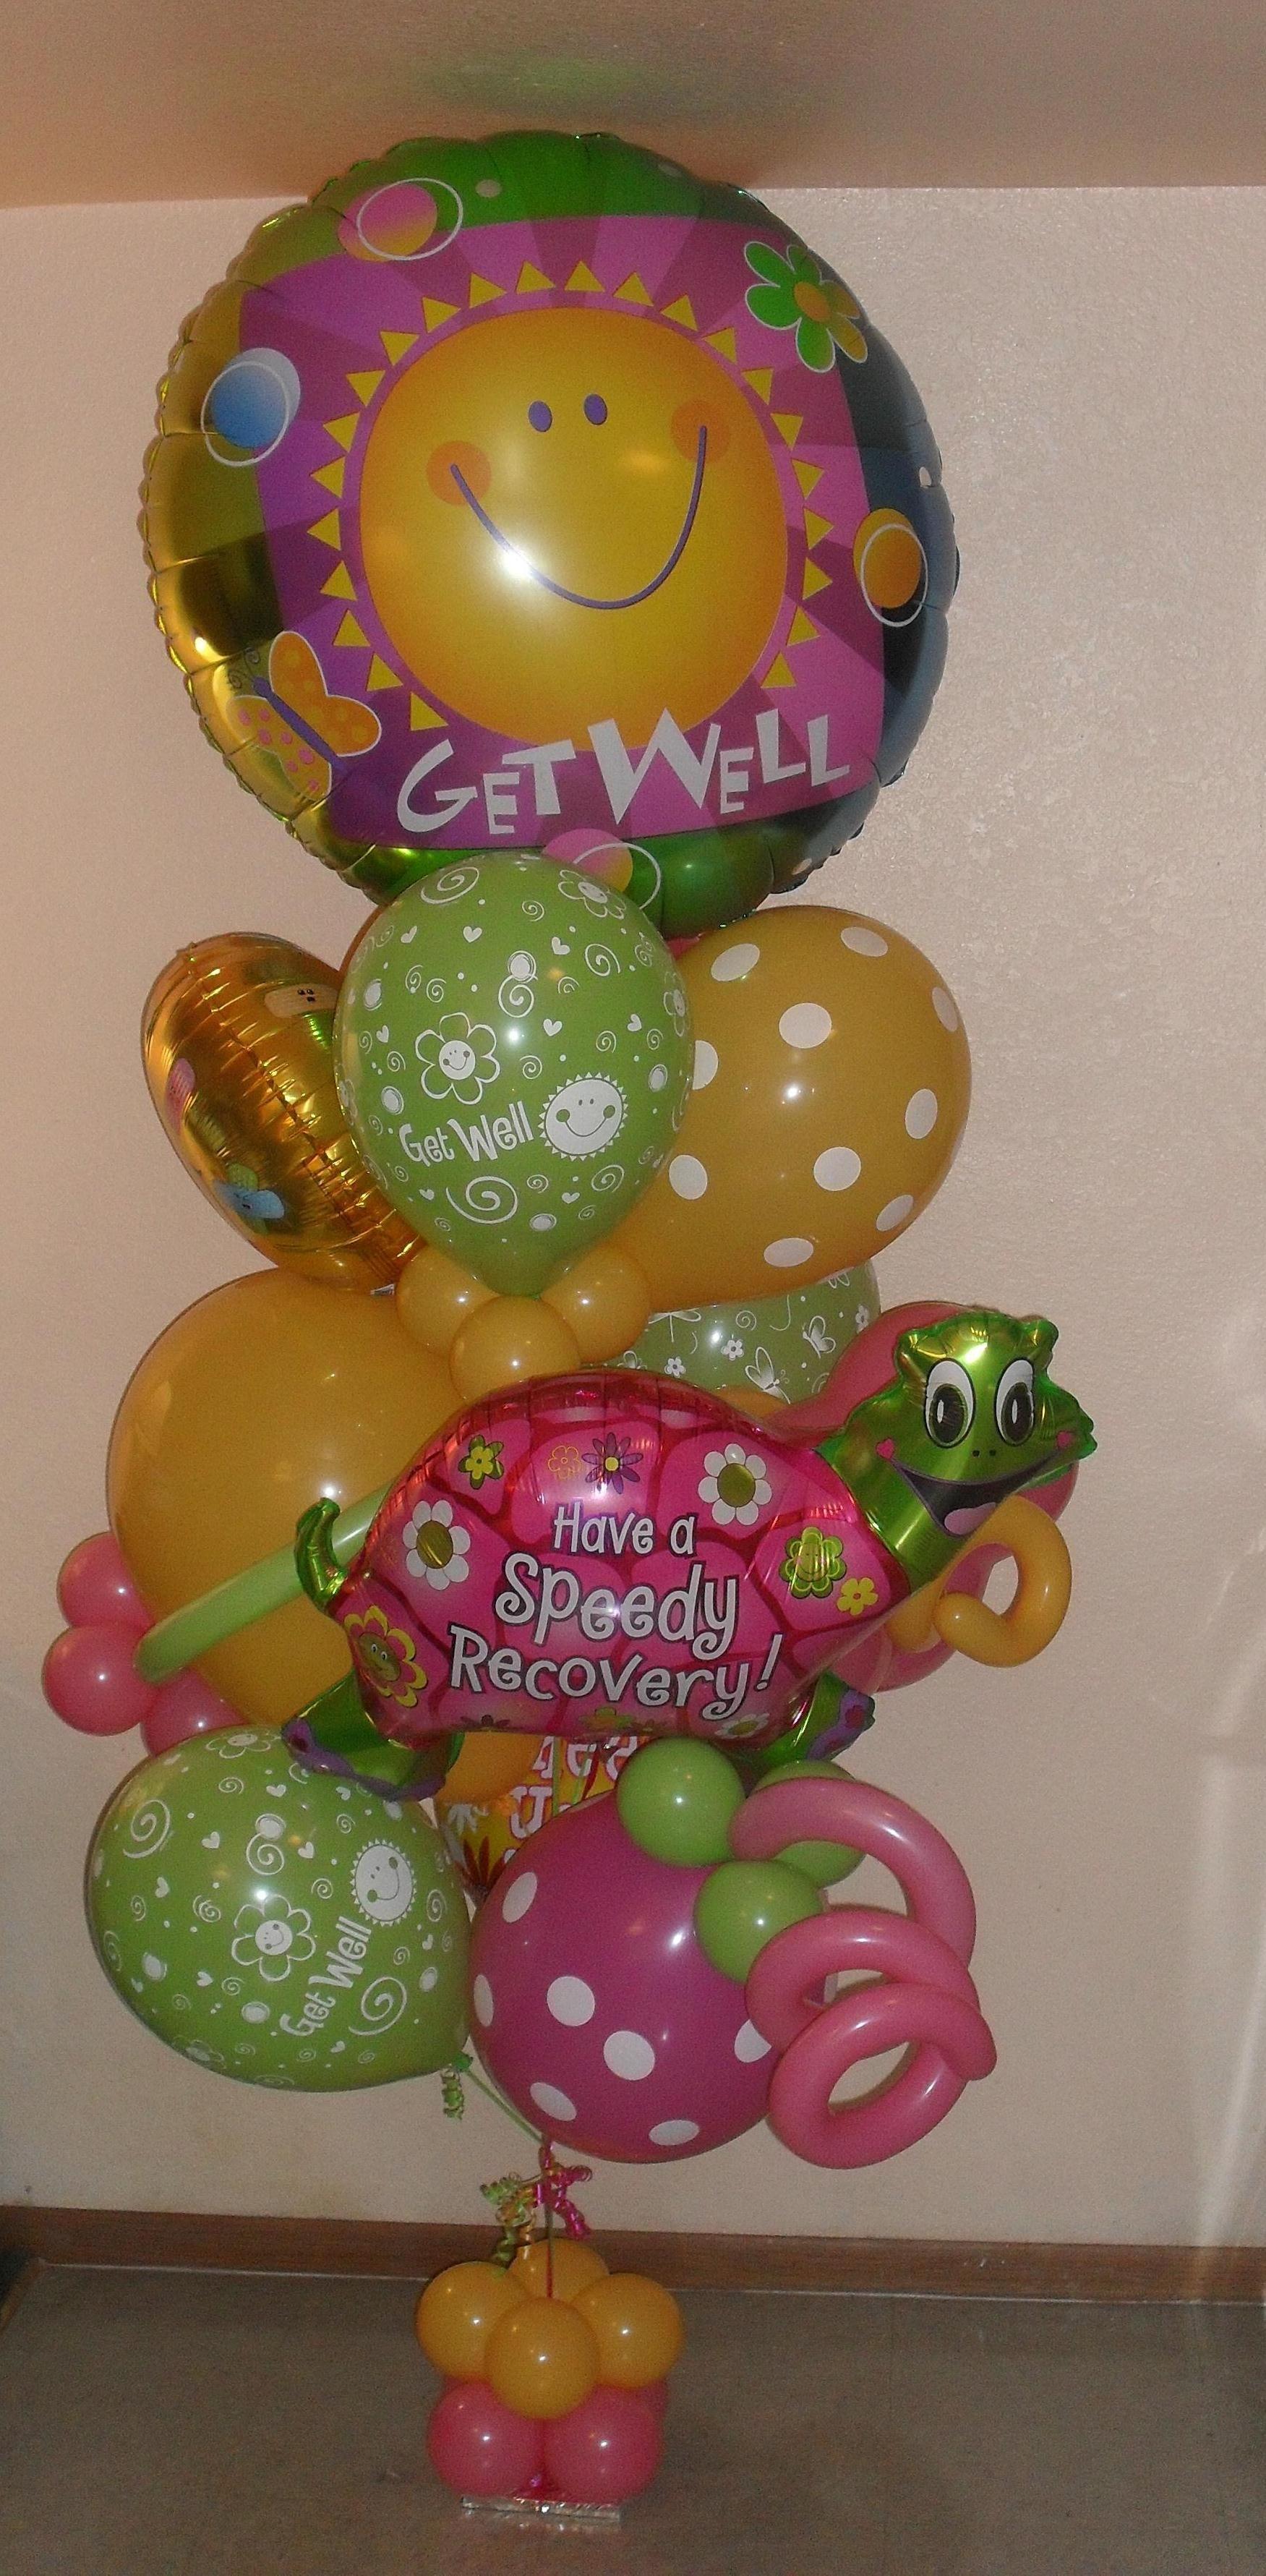 Get Well Soon Large Balloon Bouquet 122 Balloons Balloon Gift Get Well Balloons